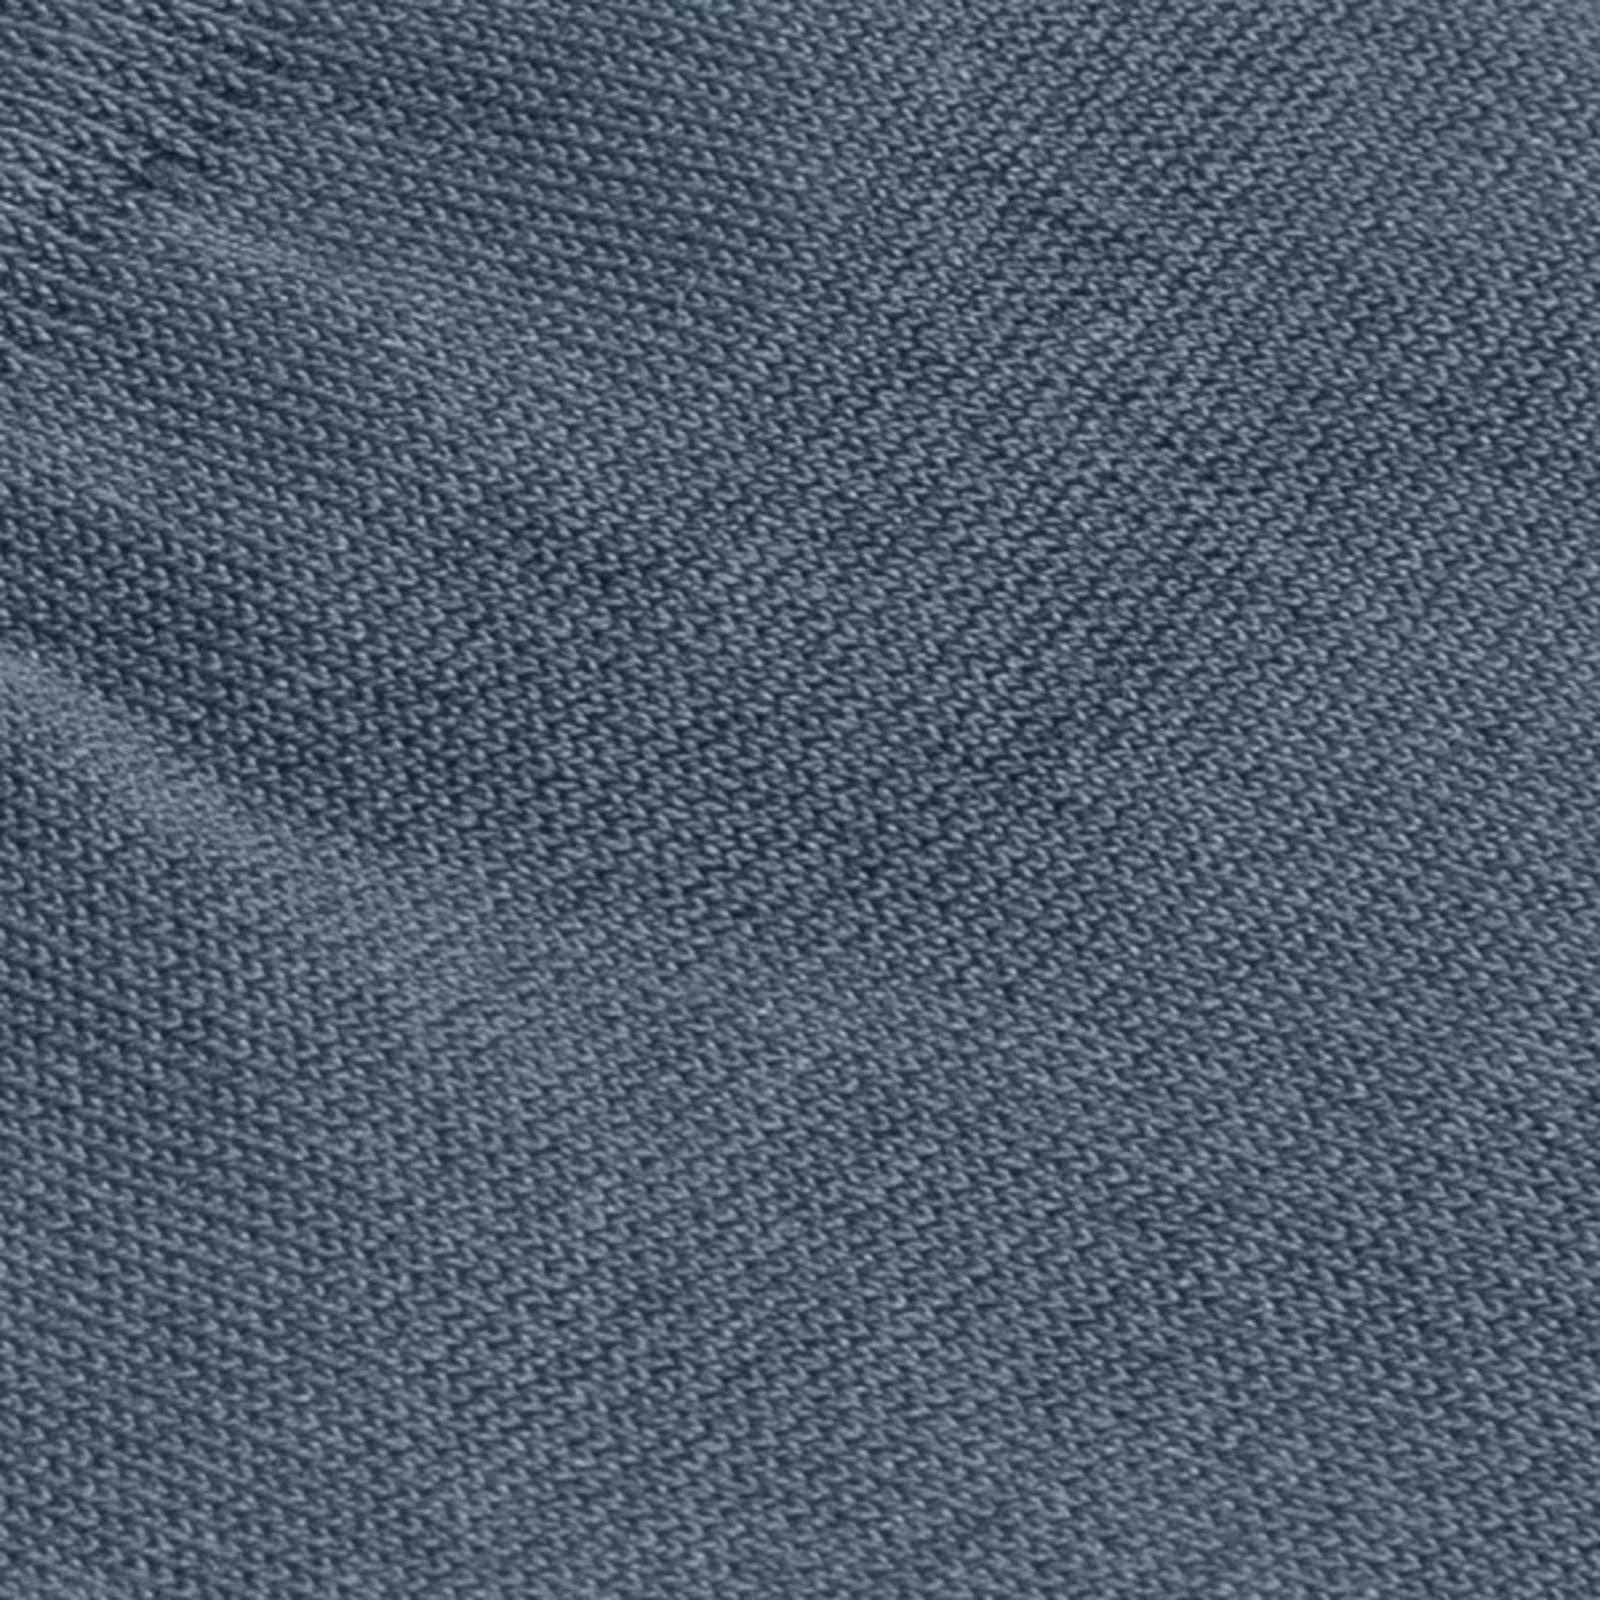 Carlo Lanza Petrol socks cotton